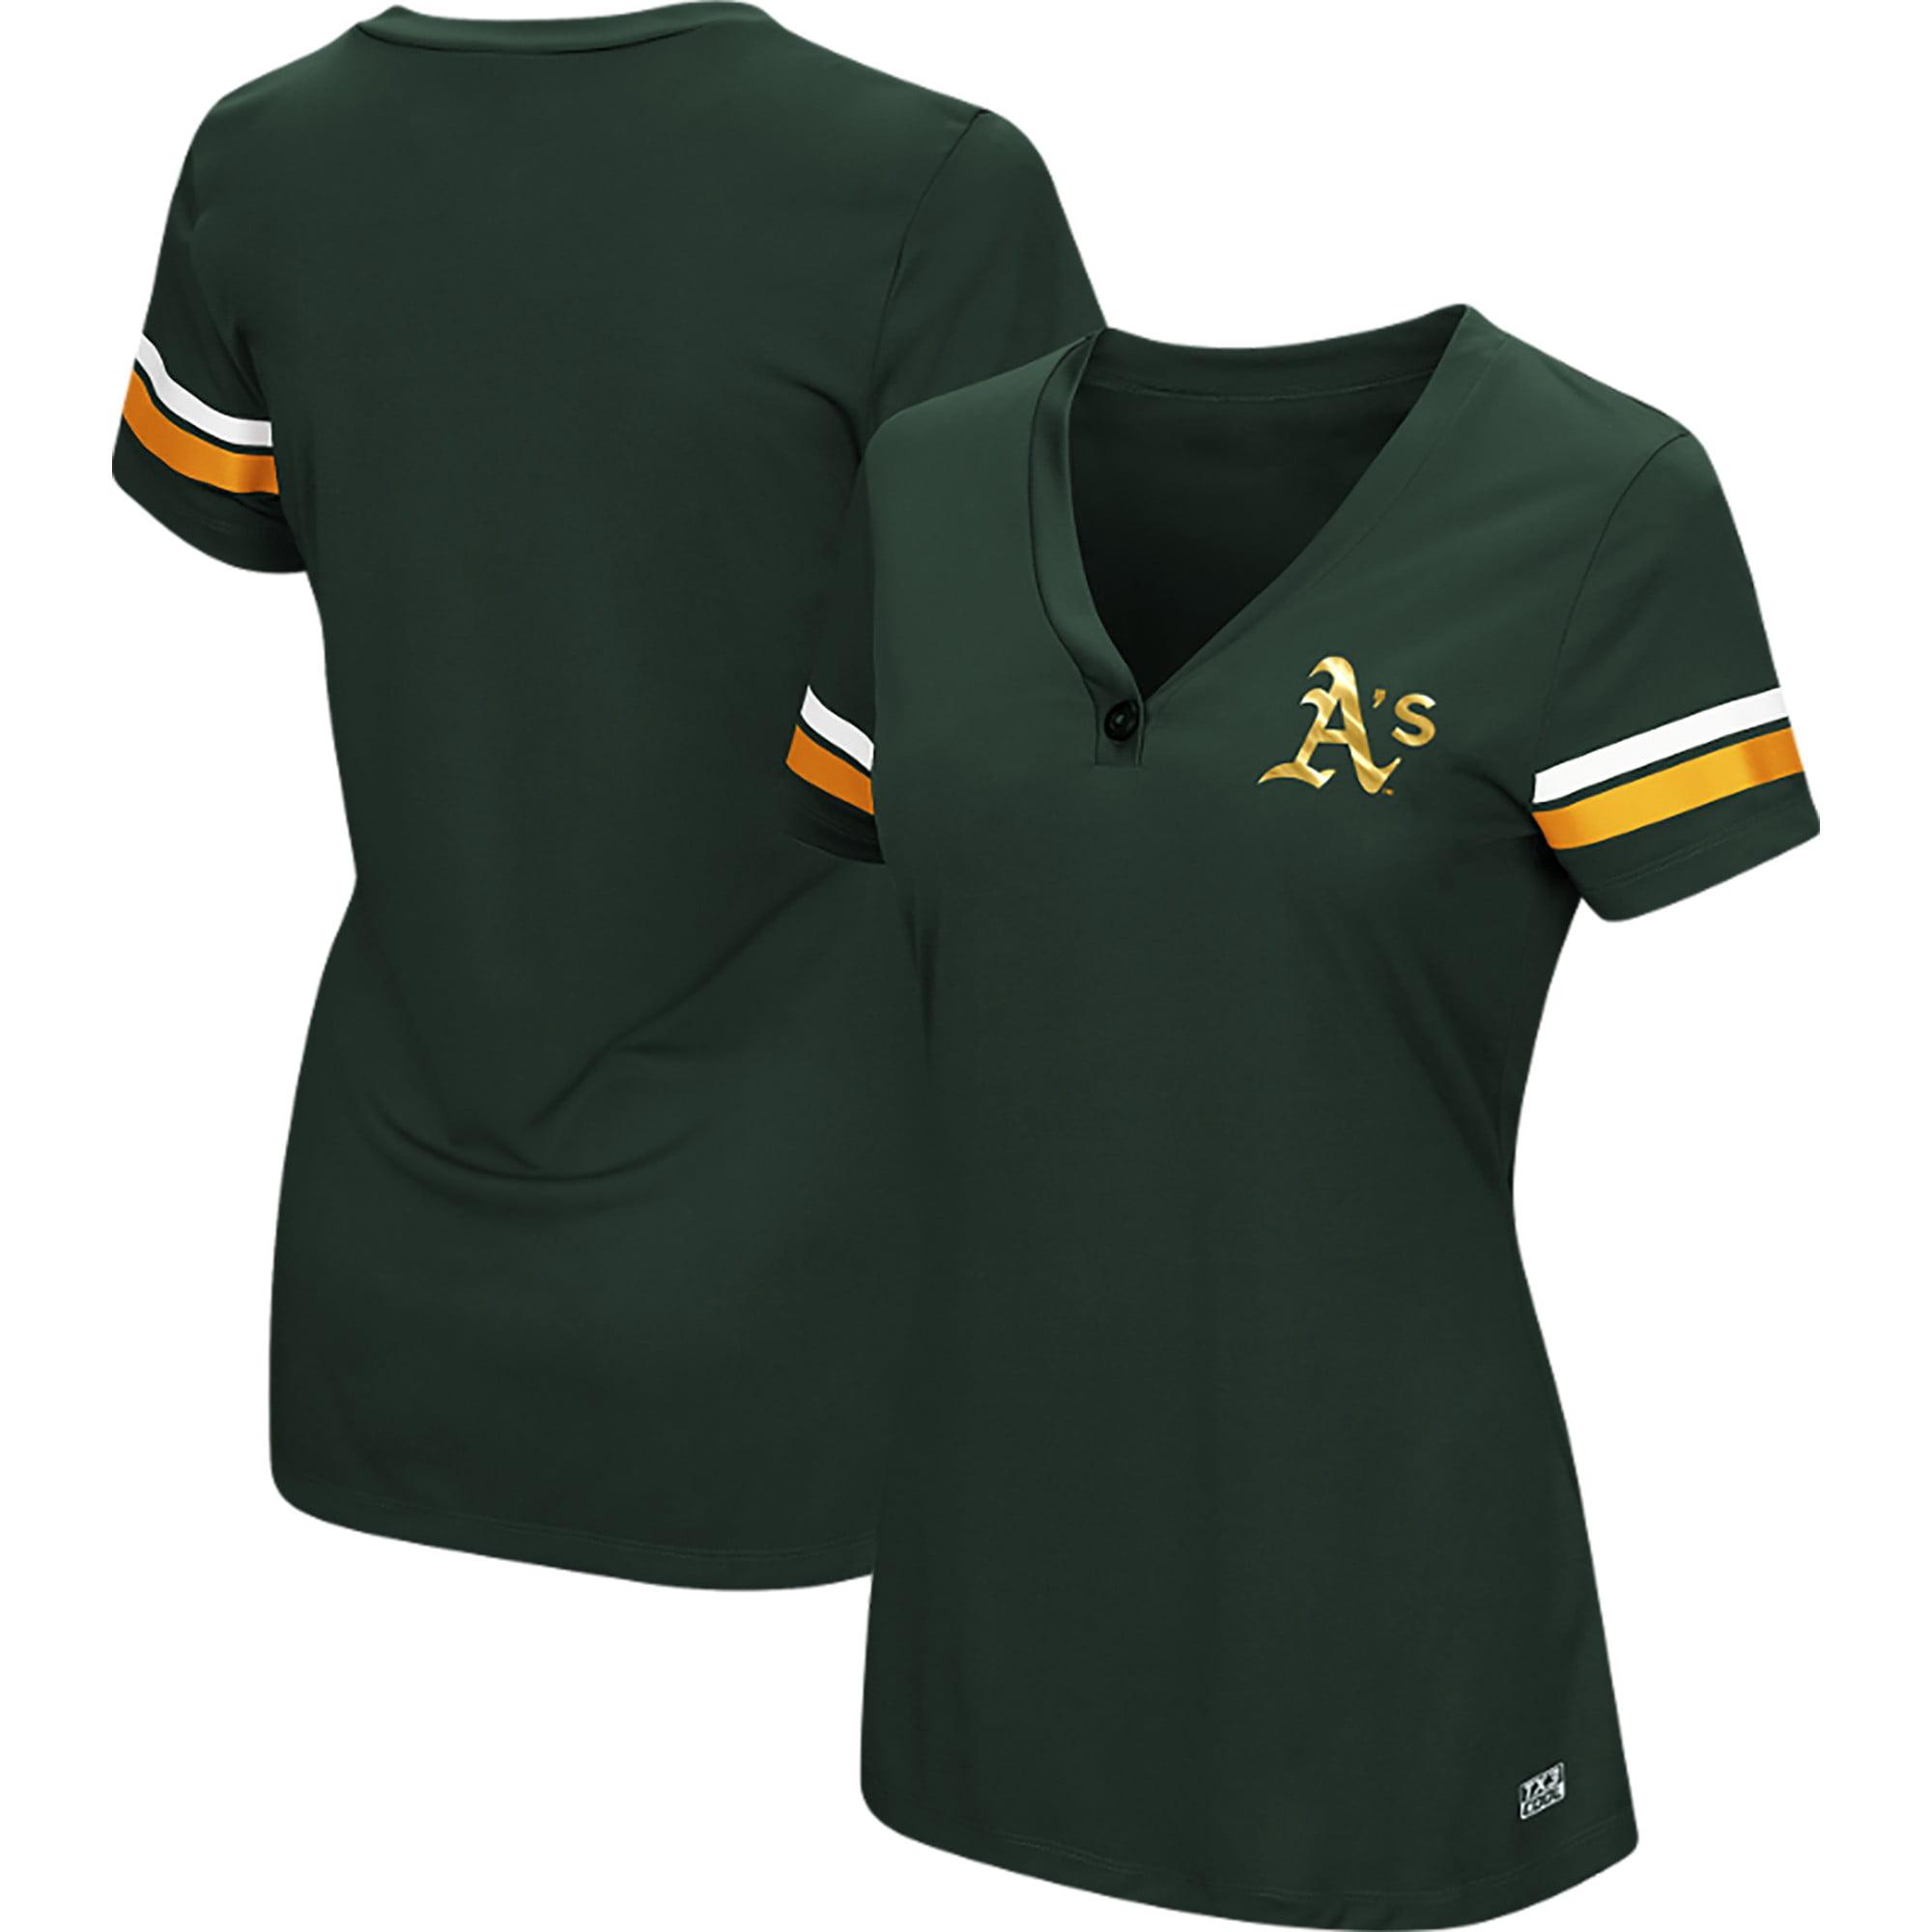 Women's Majestic Green Oakland Athletics Plus Size Sparkling Fun Button T-Shirt